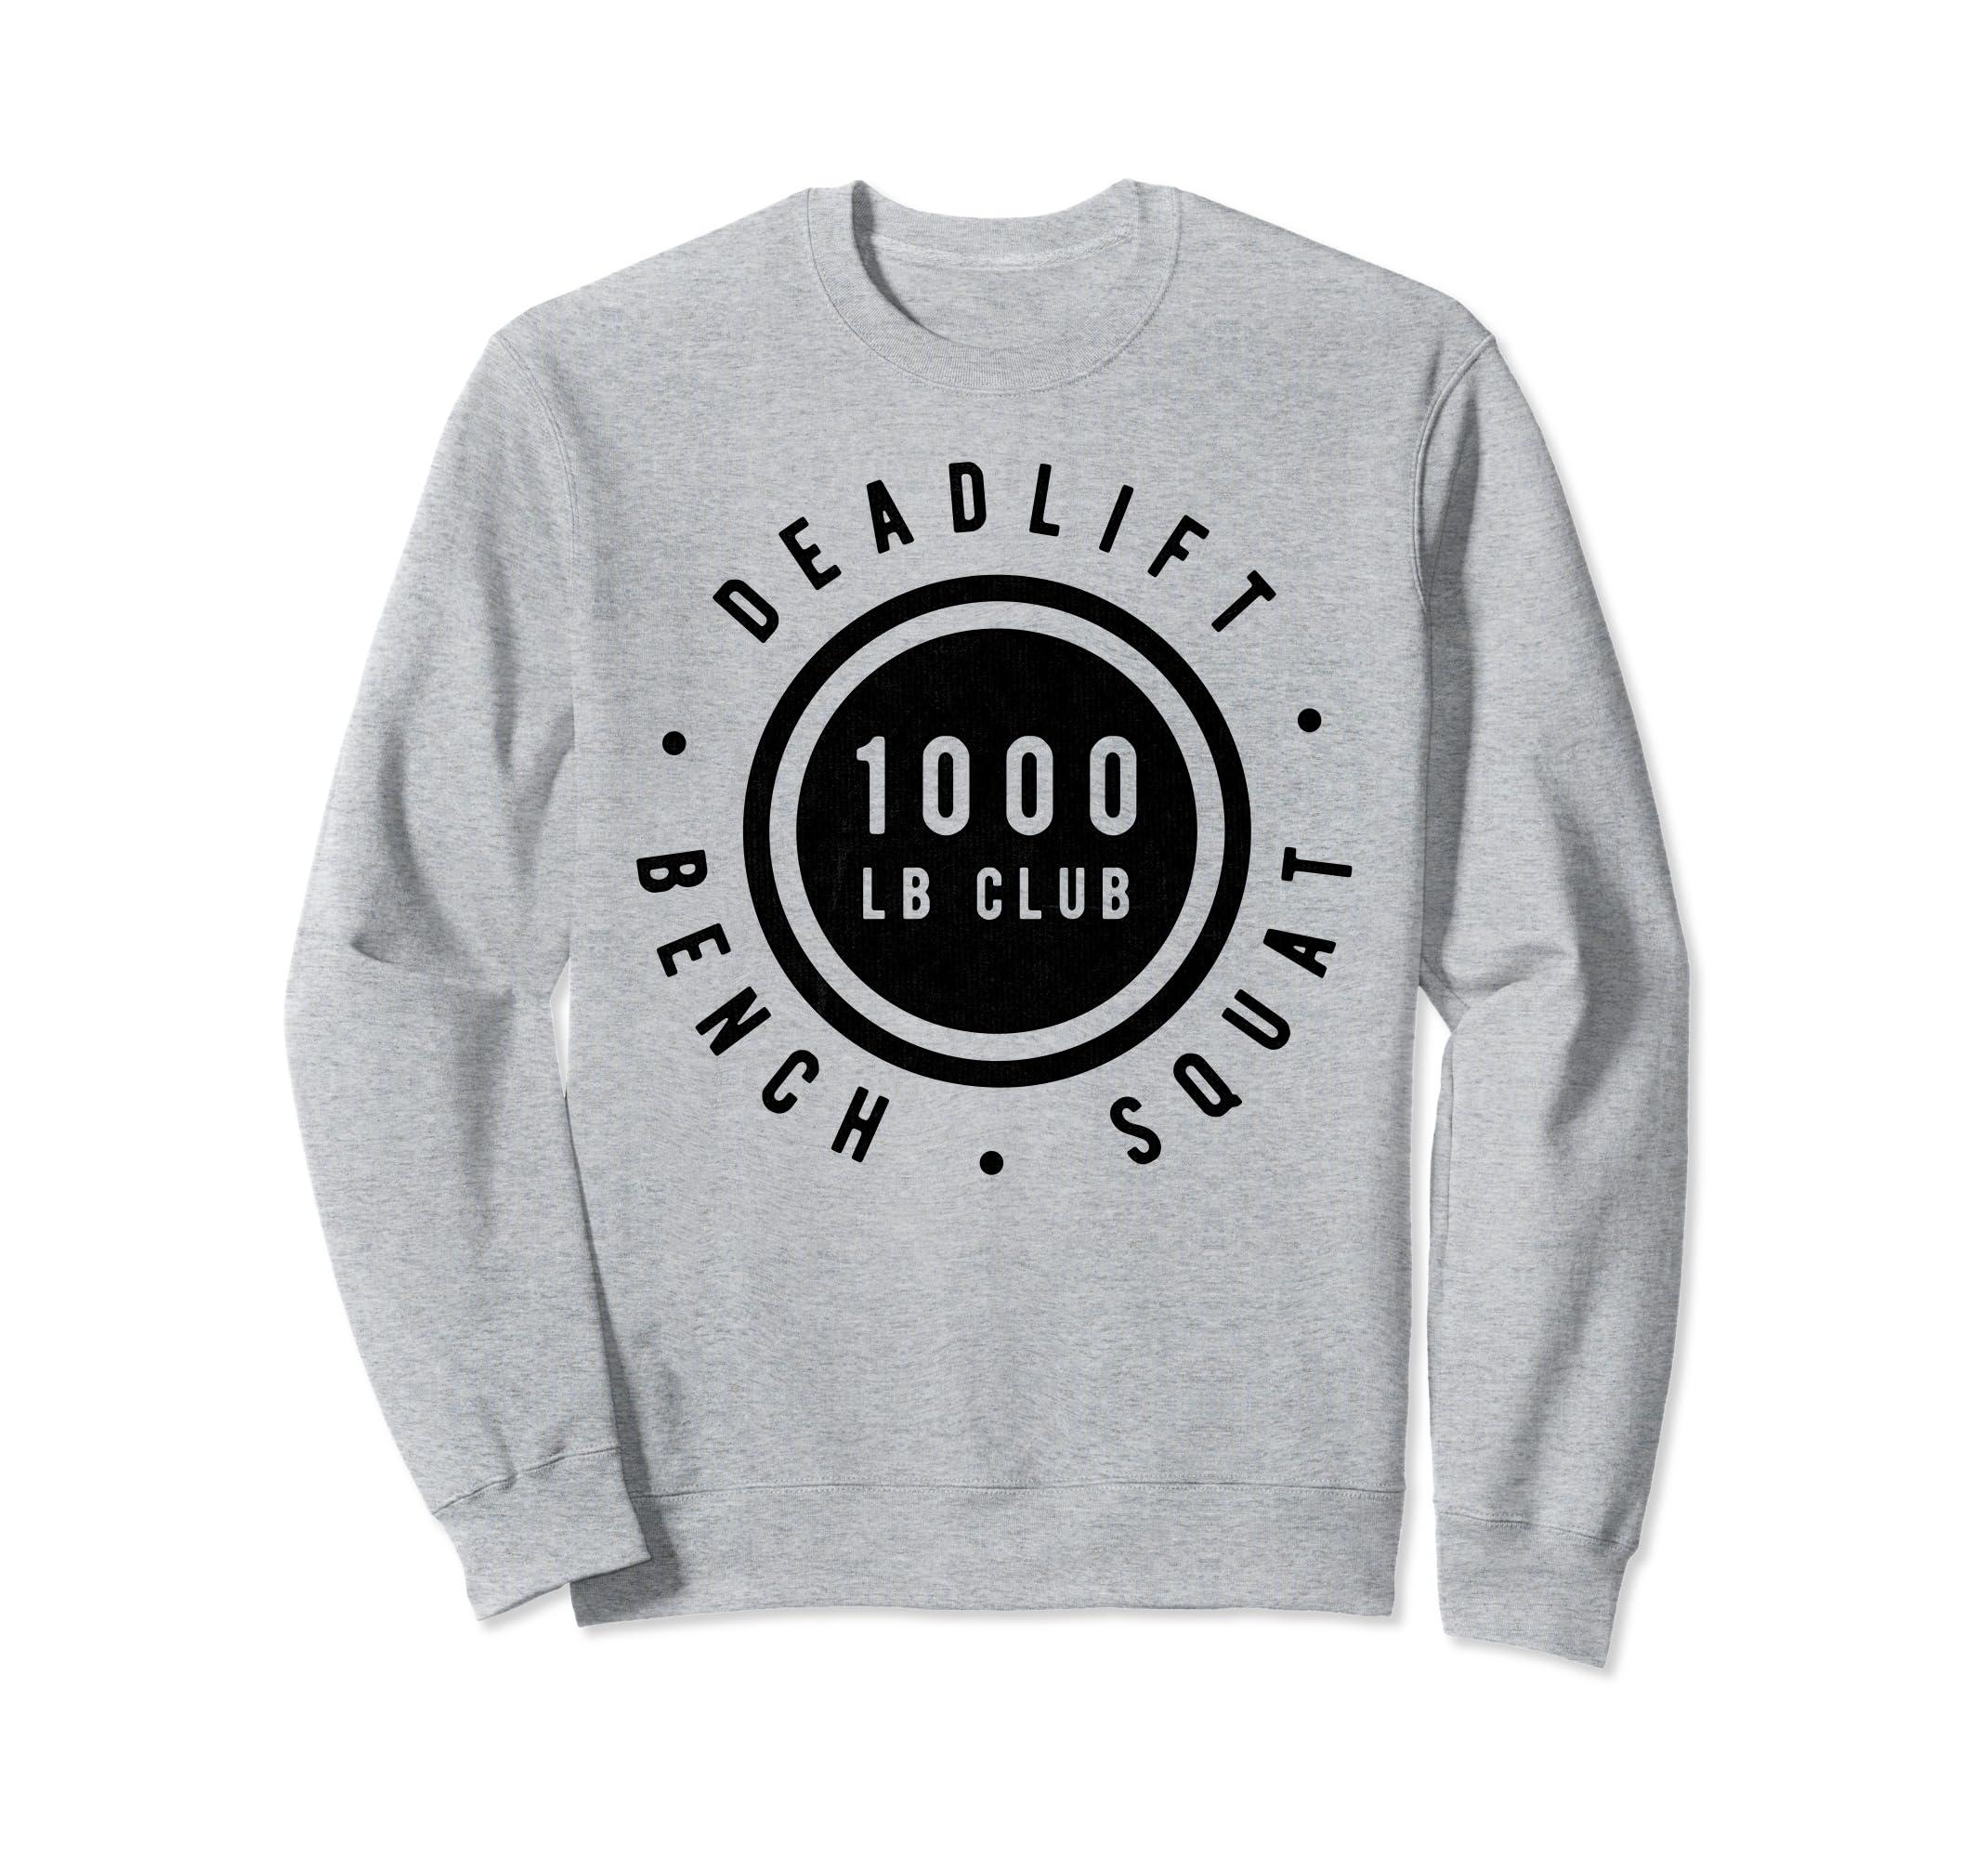 1000lb Club Body Builder Strong Classic Vintage Sweatshirt-ln